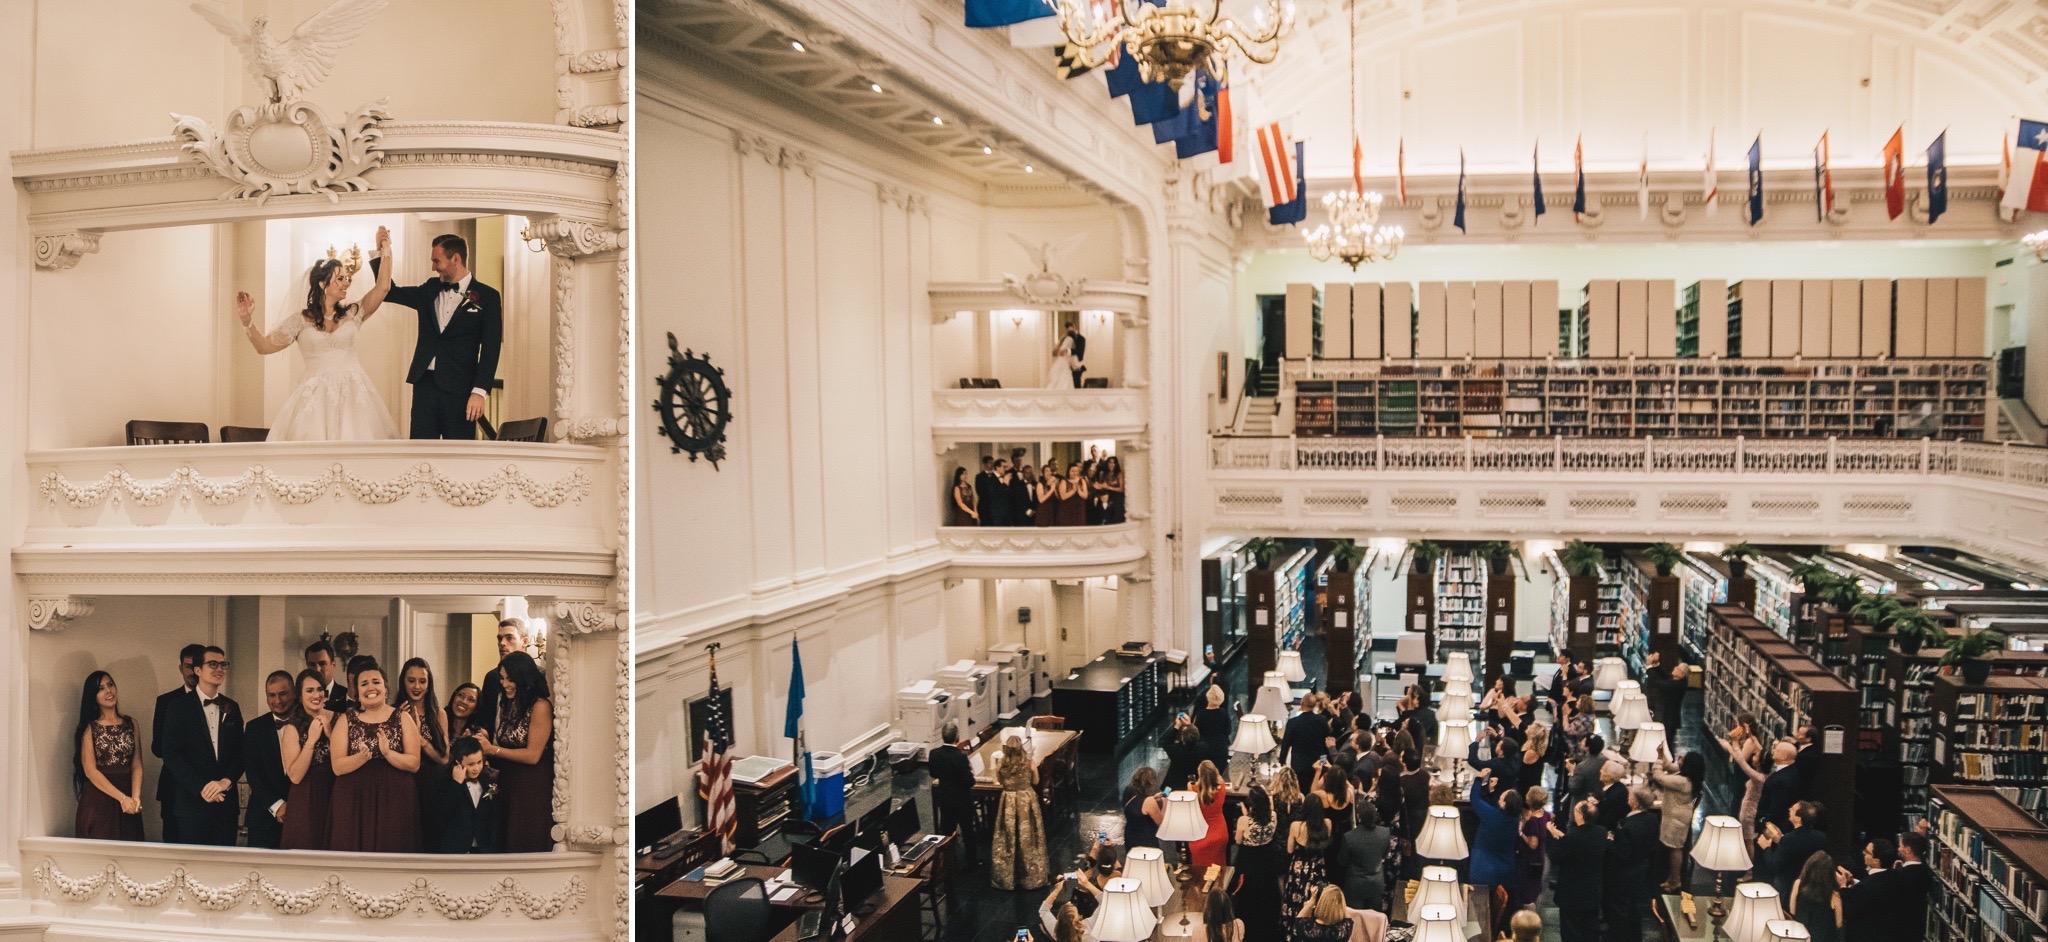 Nathan Elaina Romantic Capitol Wedding in Washington DC by Jonathan Hannah Photography14.jpg